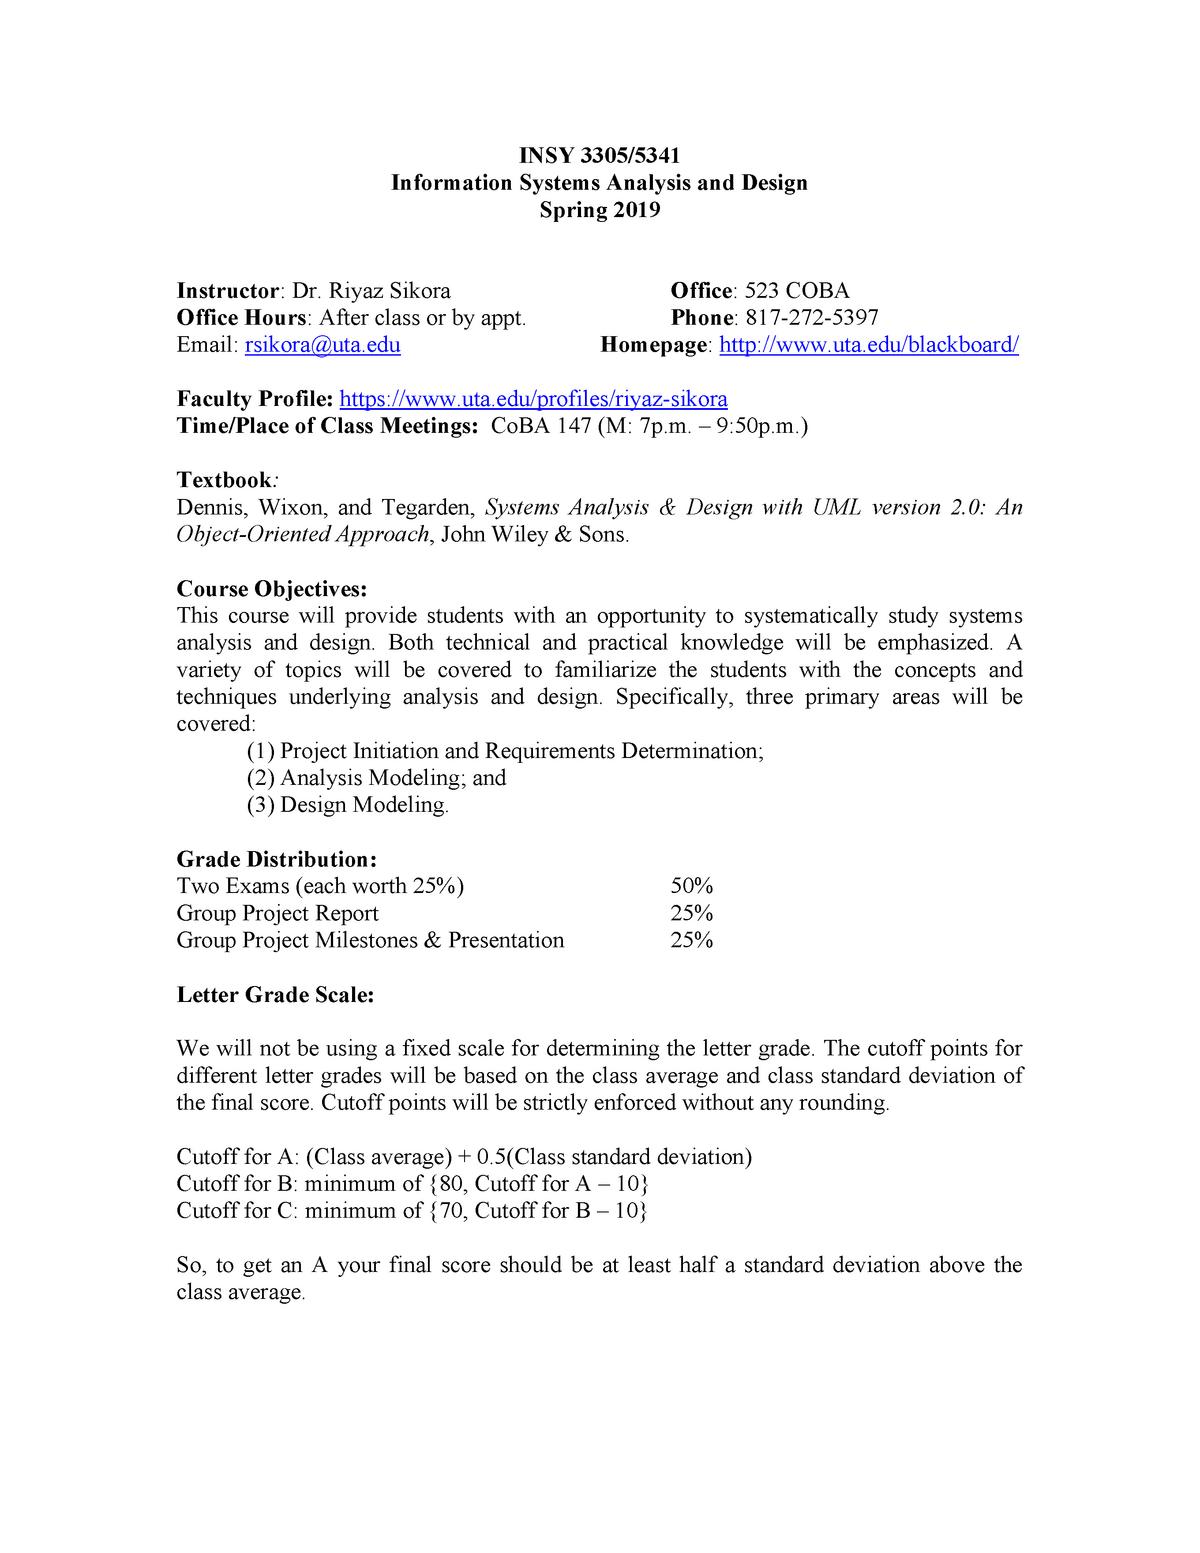 5341Syllabus Spring 19 - Analysis and Design INSY 5341 - StuDocu